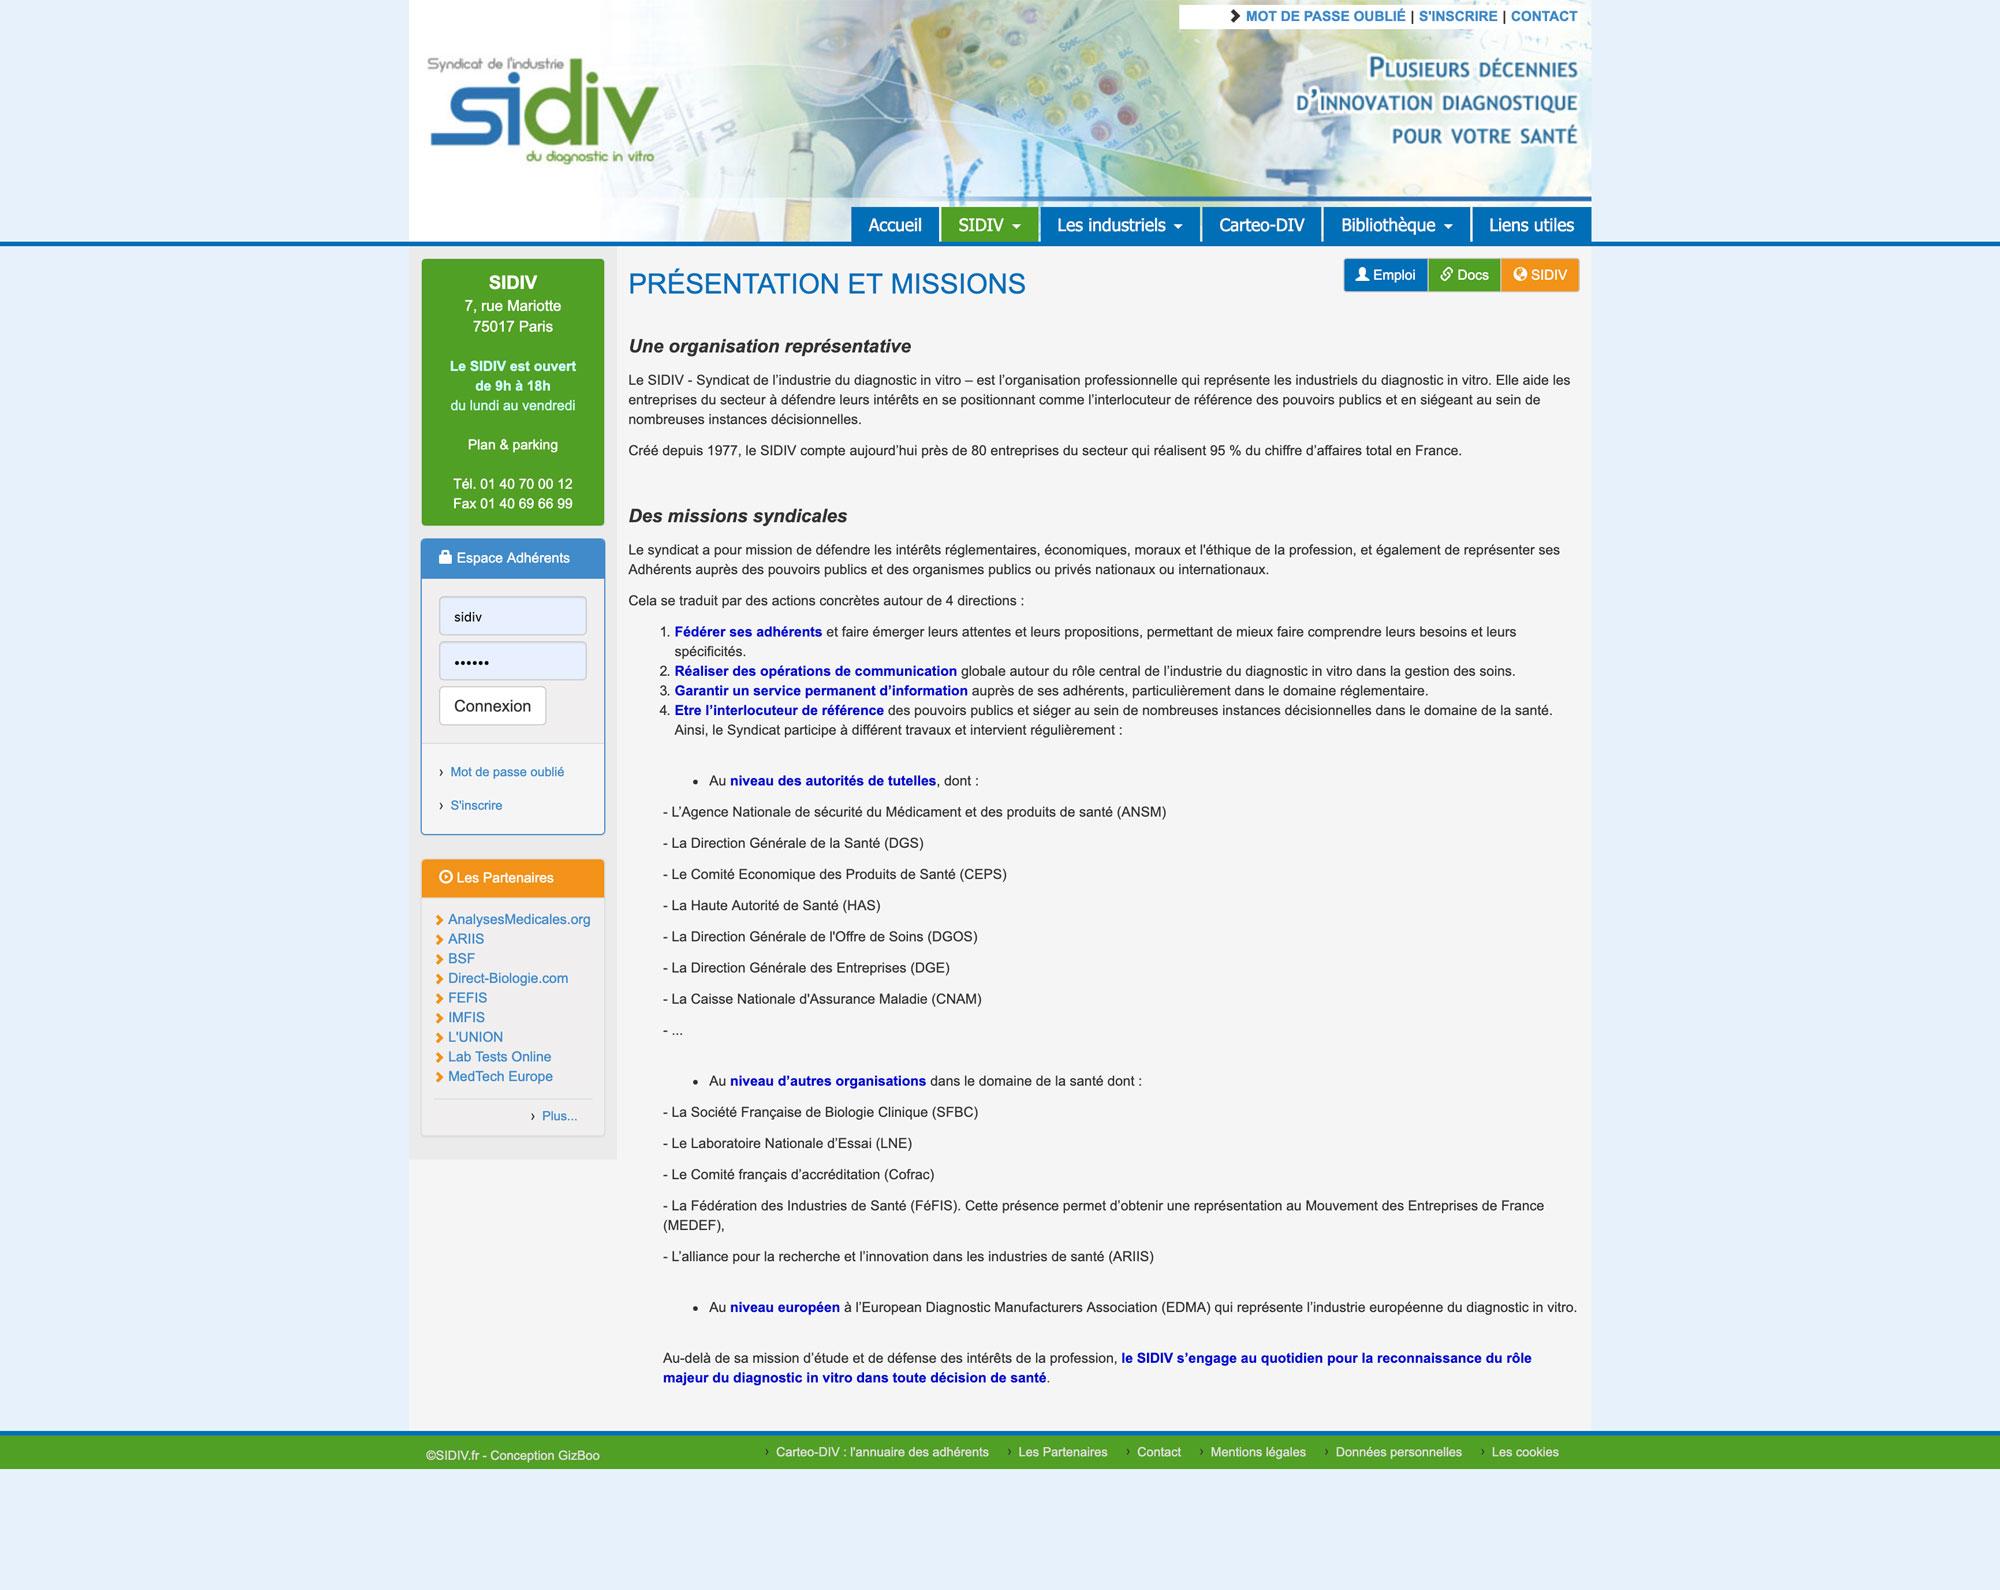 SIDIV